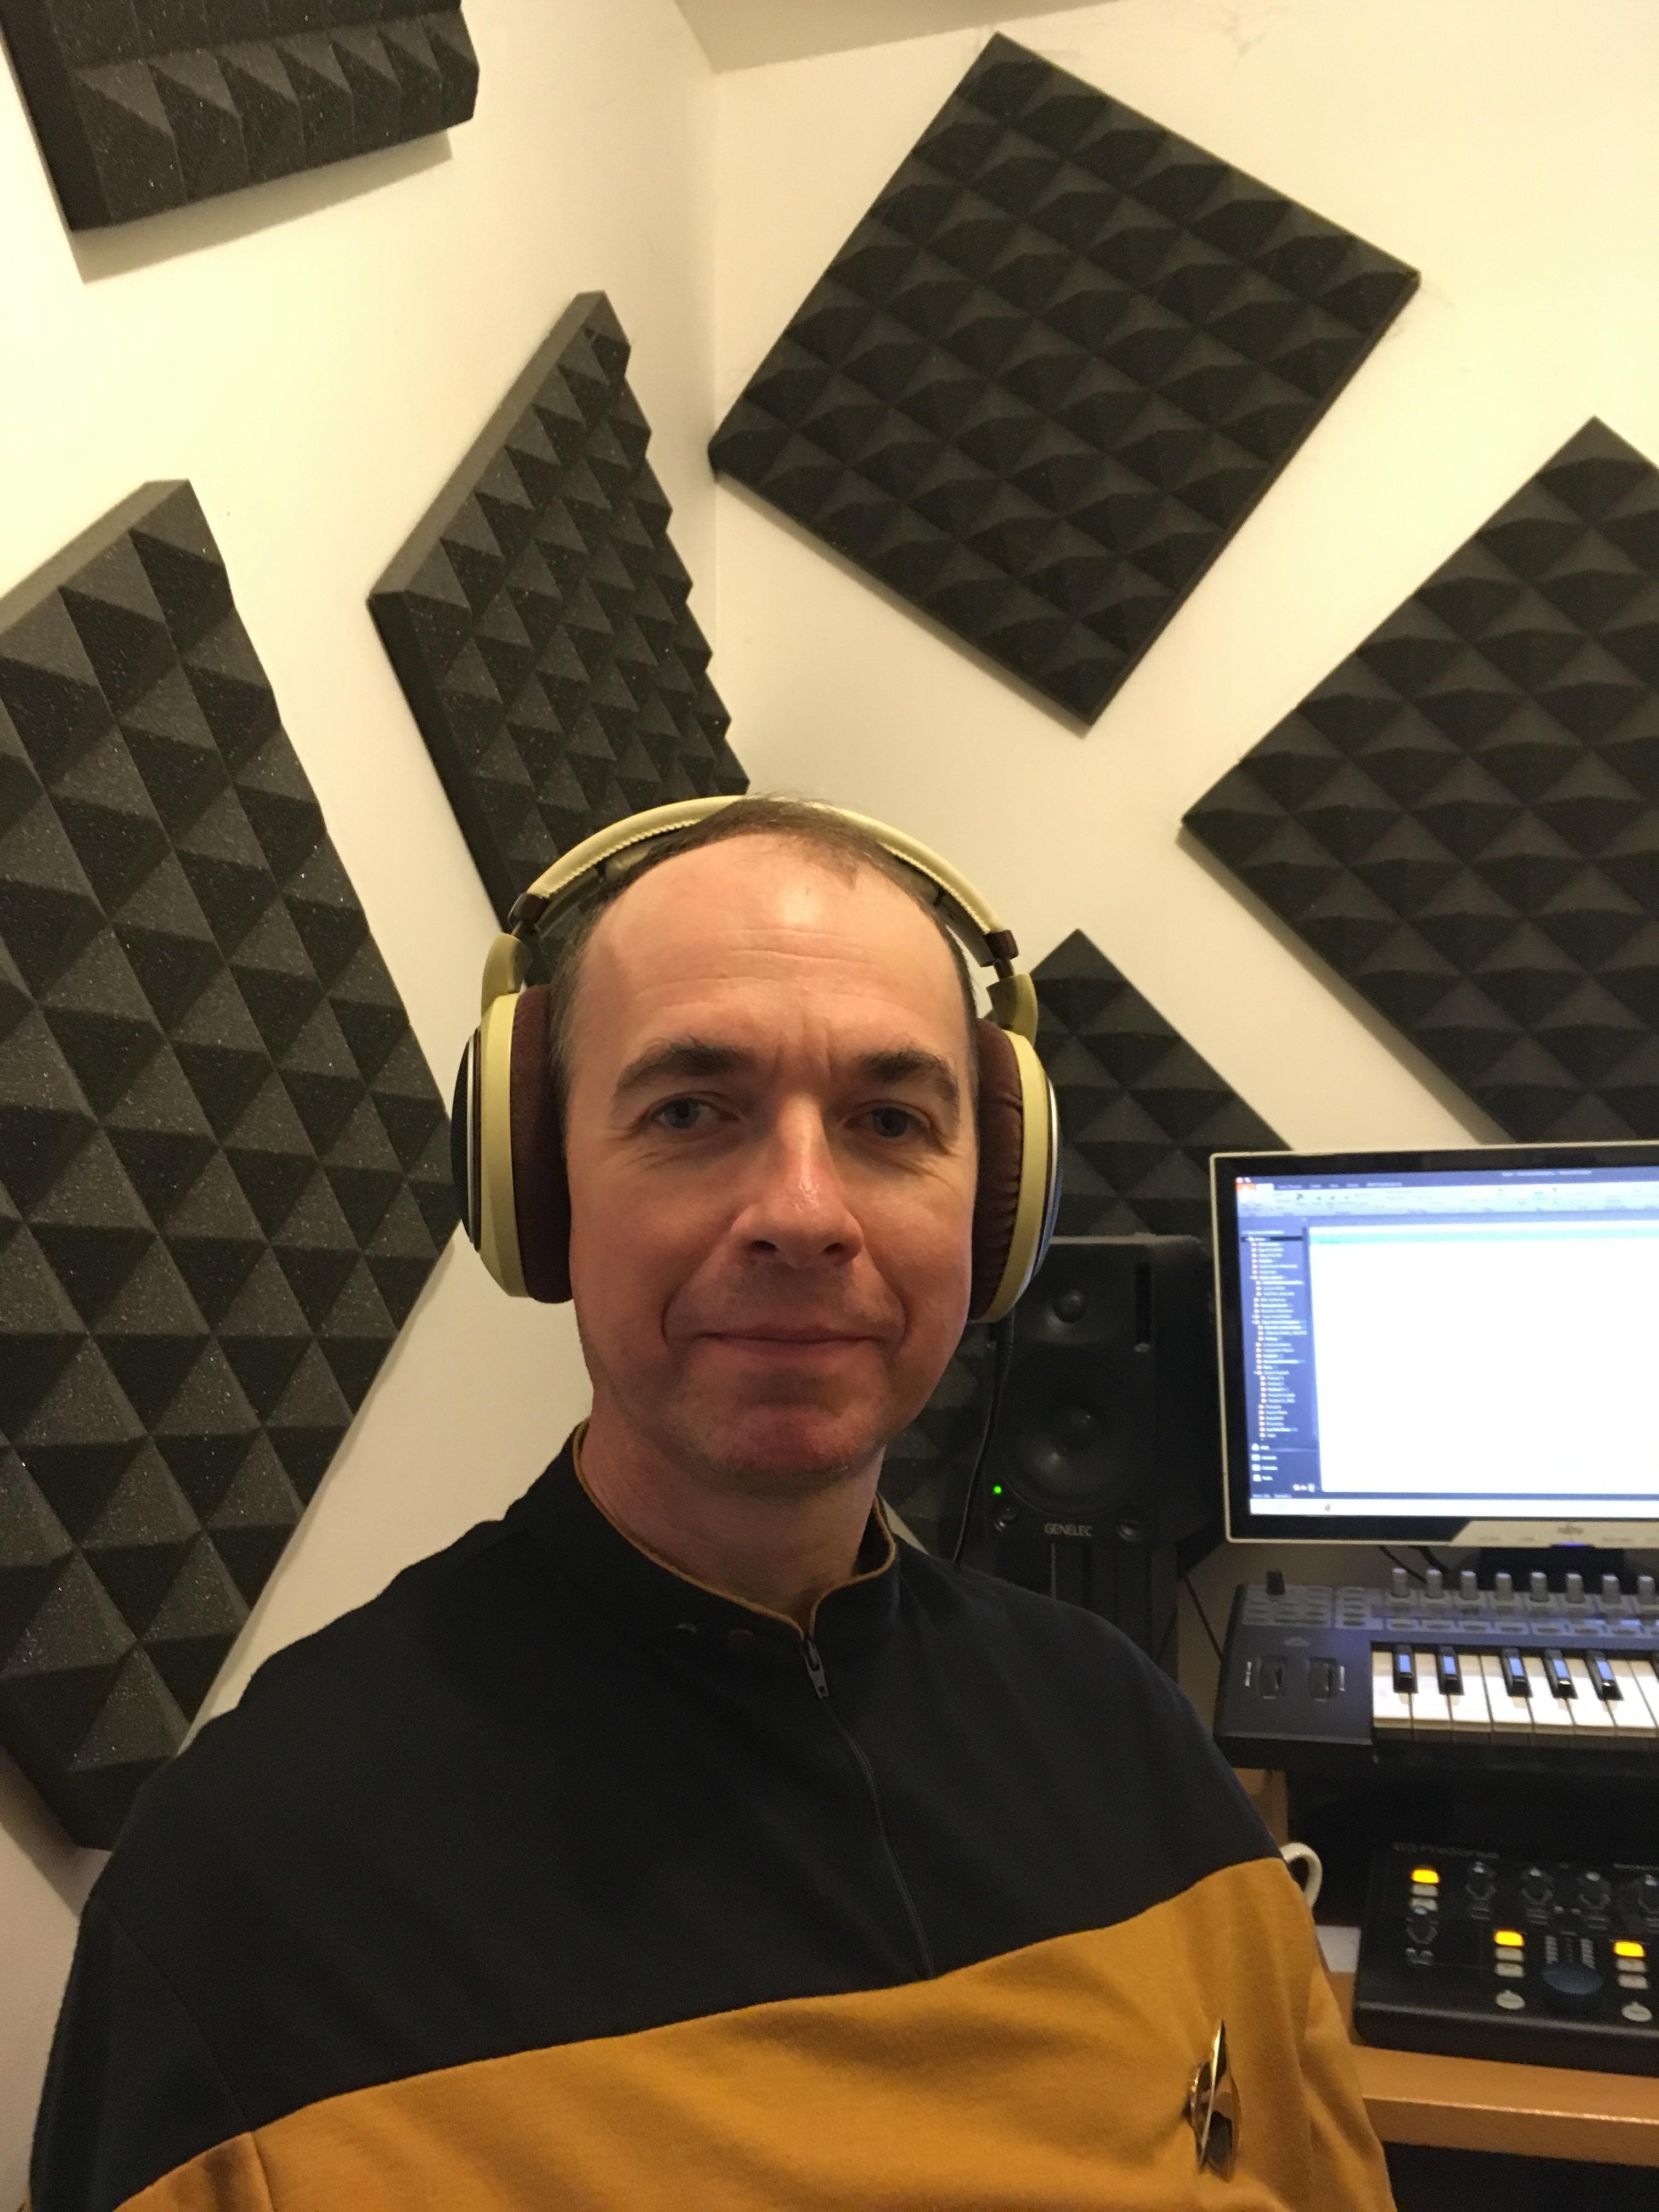 Ian Rattray in the recording studio